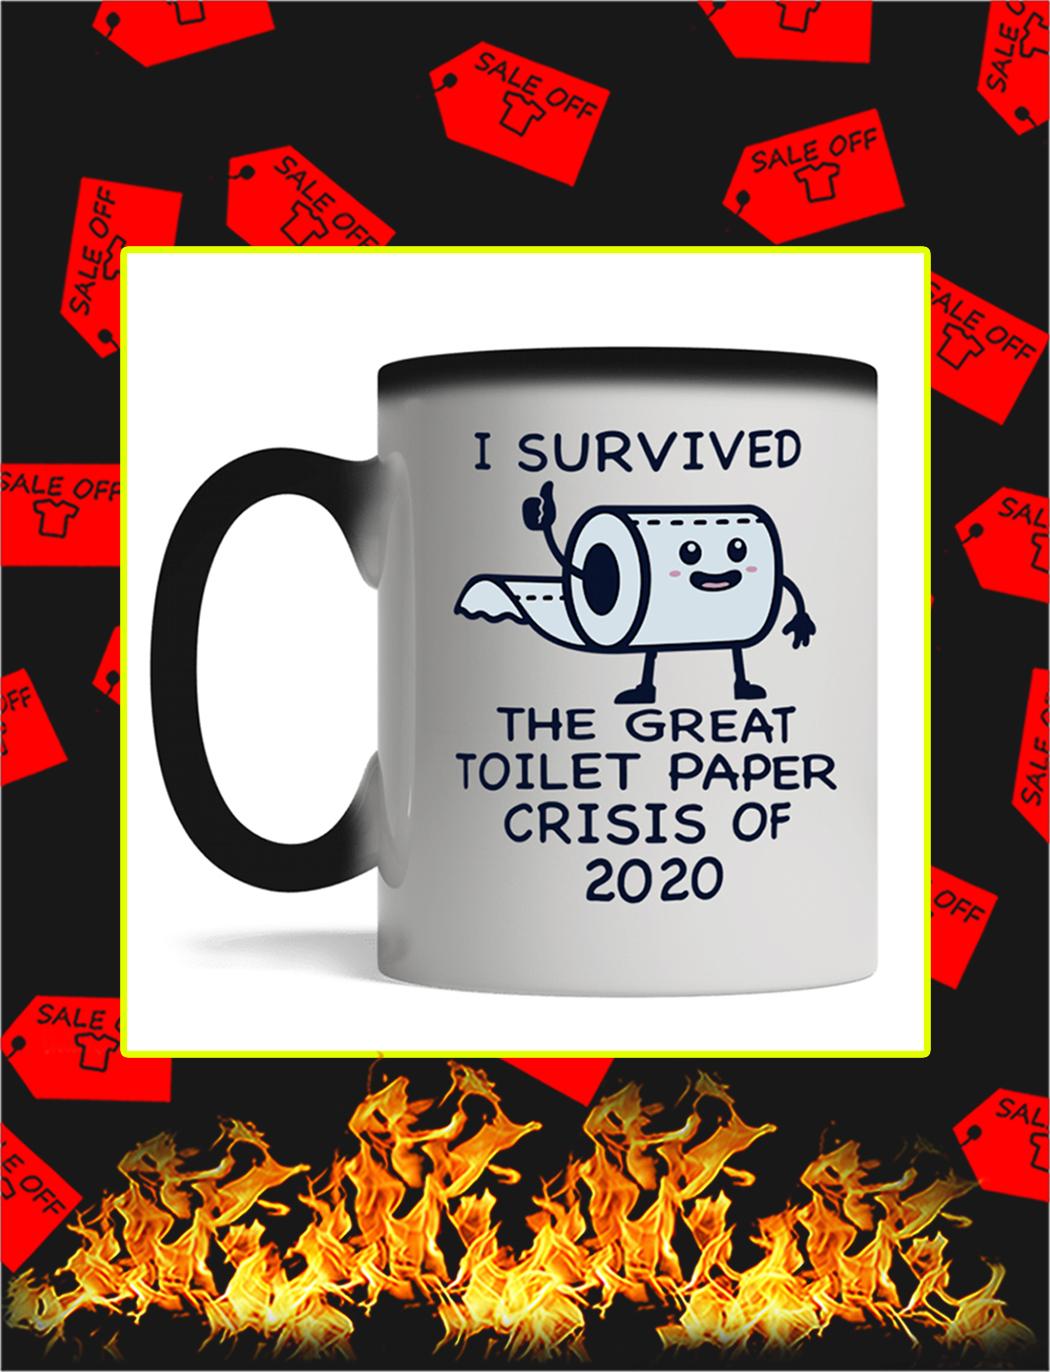 I Survived The Great Toilet Paper Crisis Of 2020 Mug- magic mug